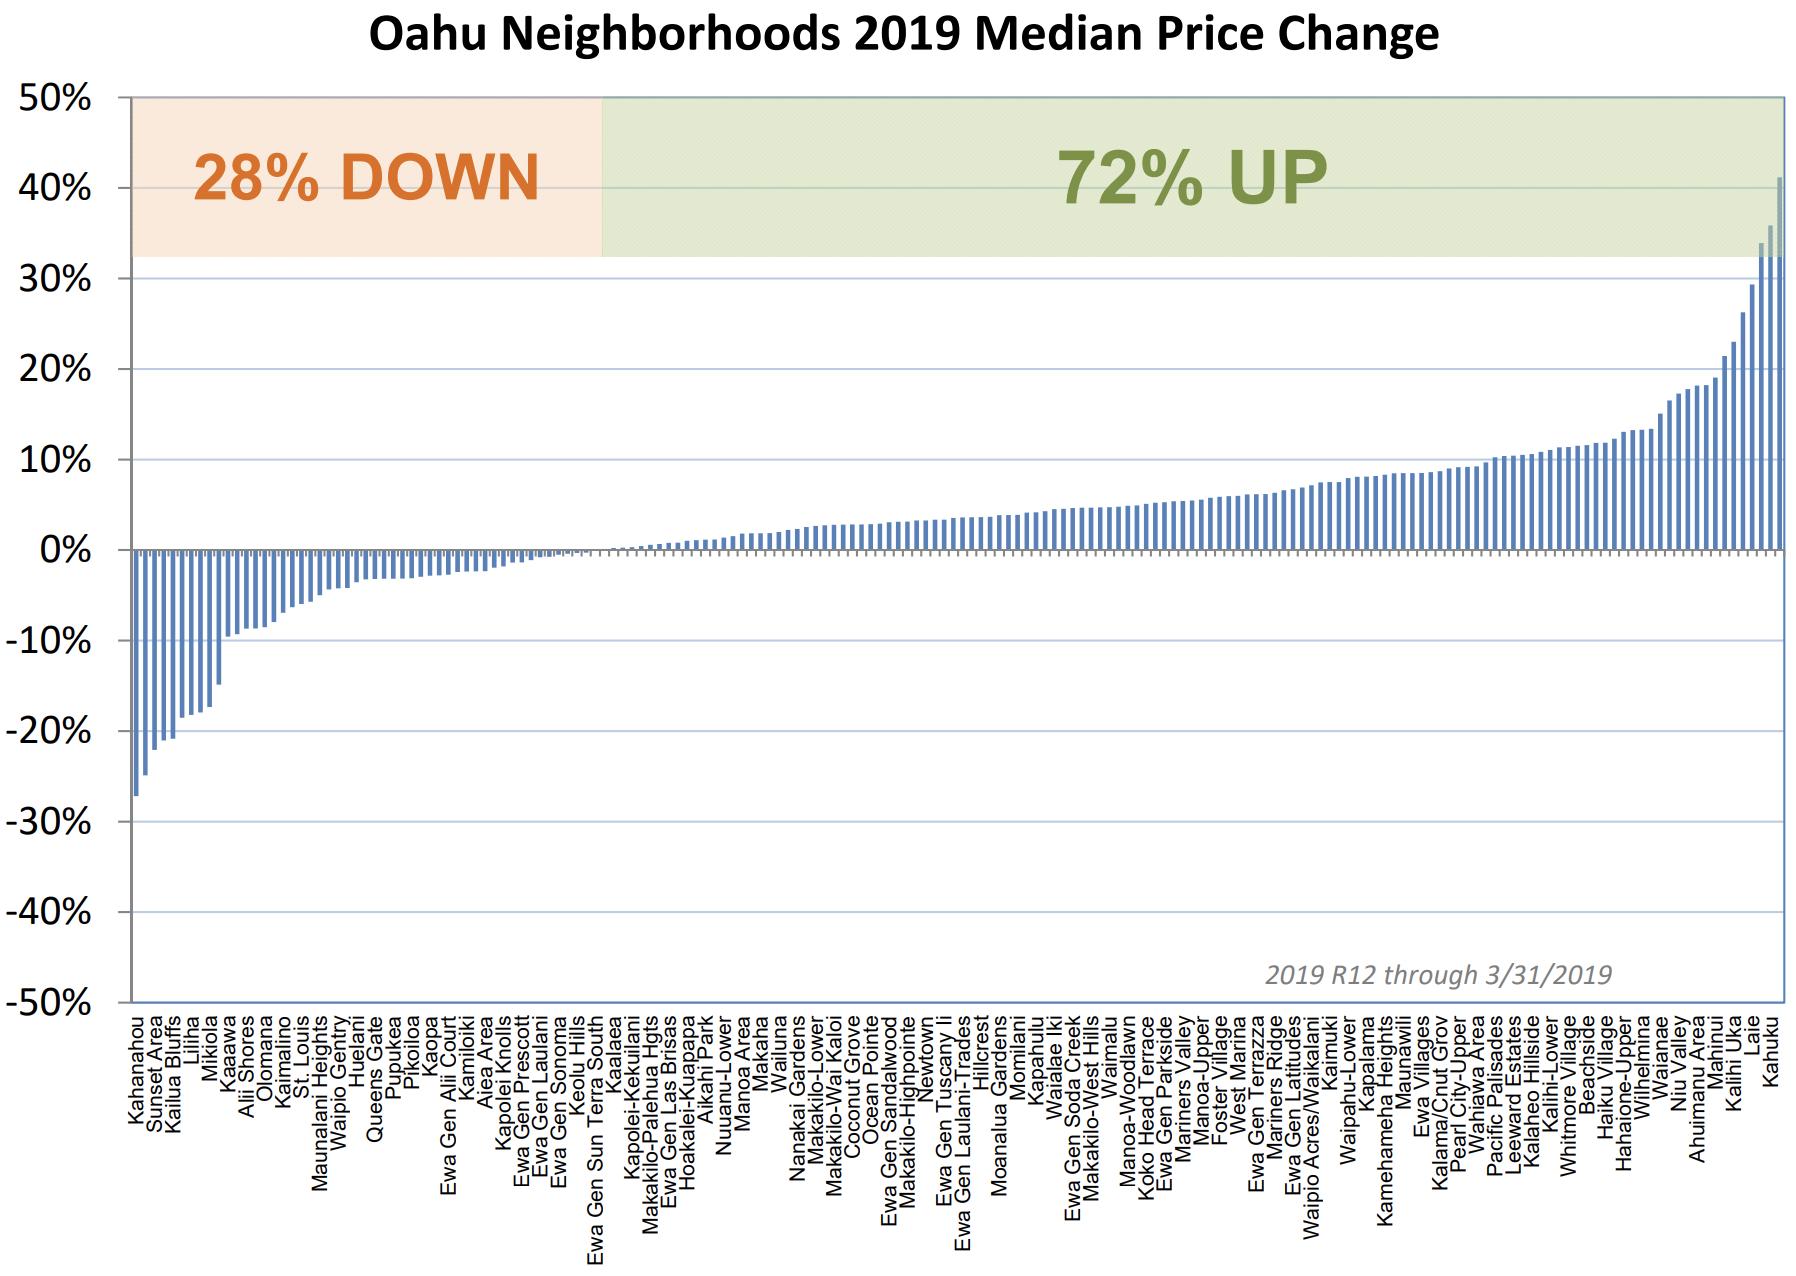 April 2019 Oahu Neighborhood Price Trends